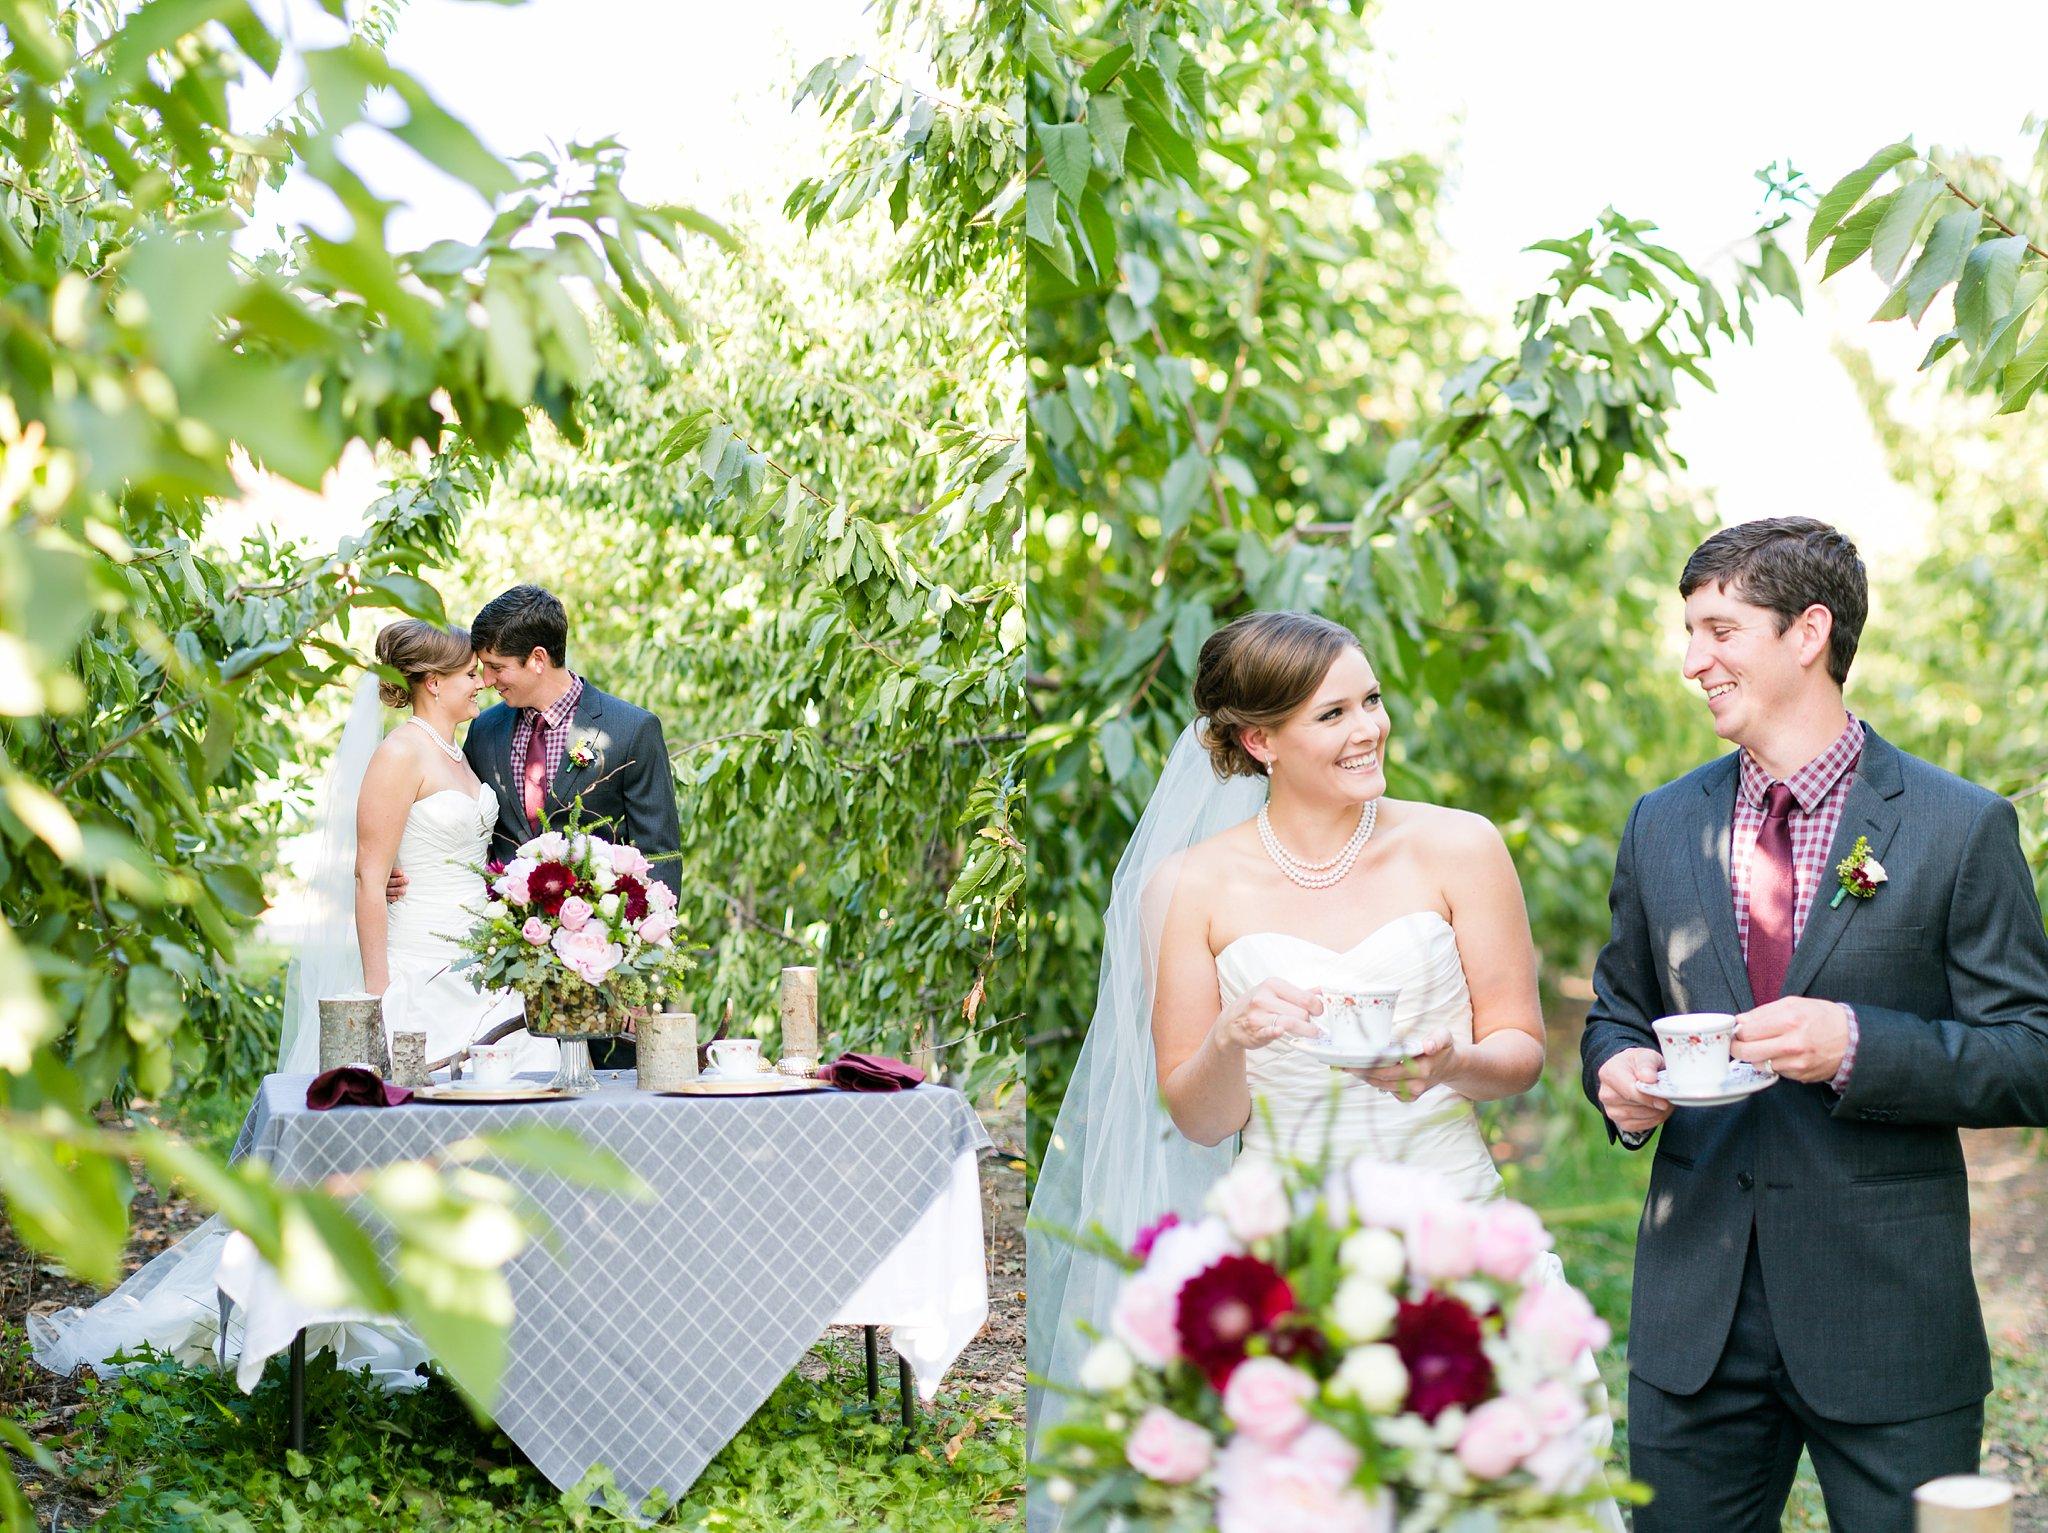 Chelan Washington Wedding Photos Megan Kelsey Photography Delight Wedding Workshop Styled Shoot Annalee & Scot-60.jpg